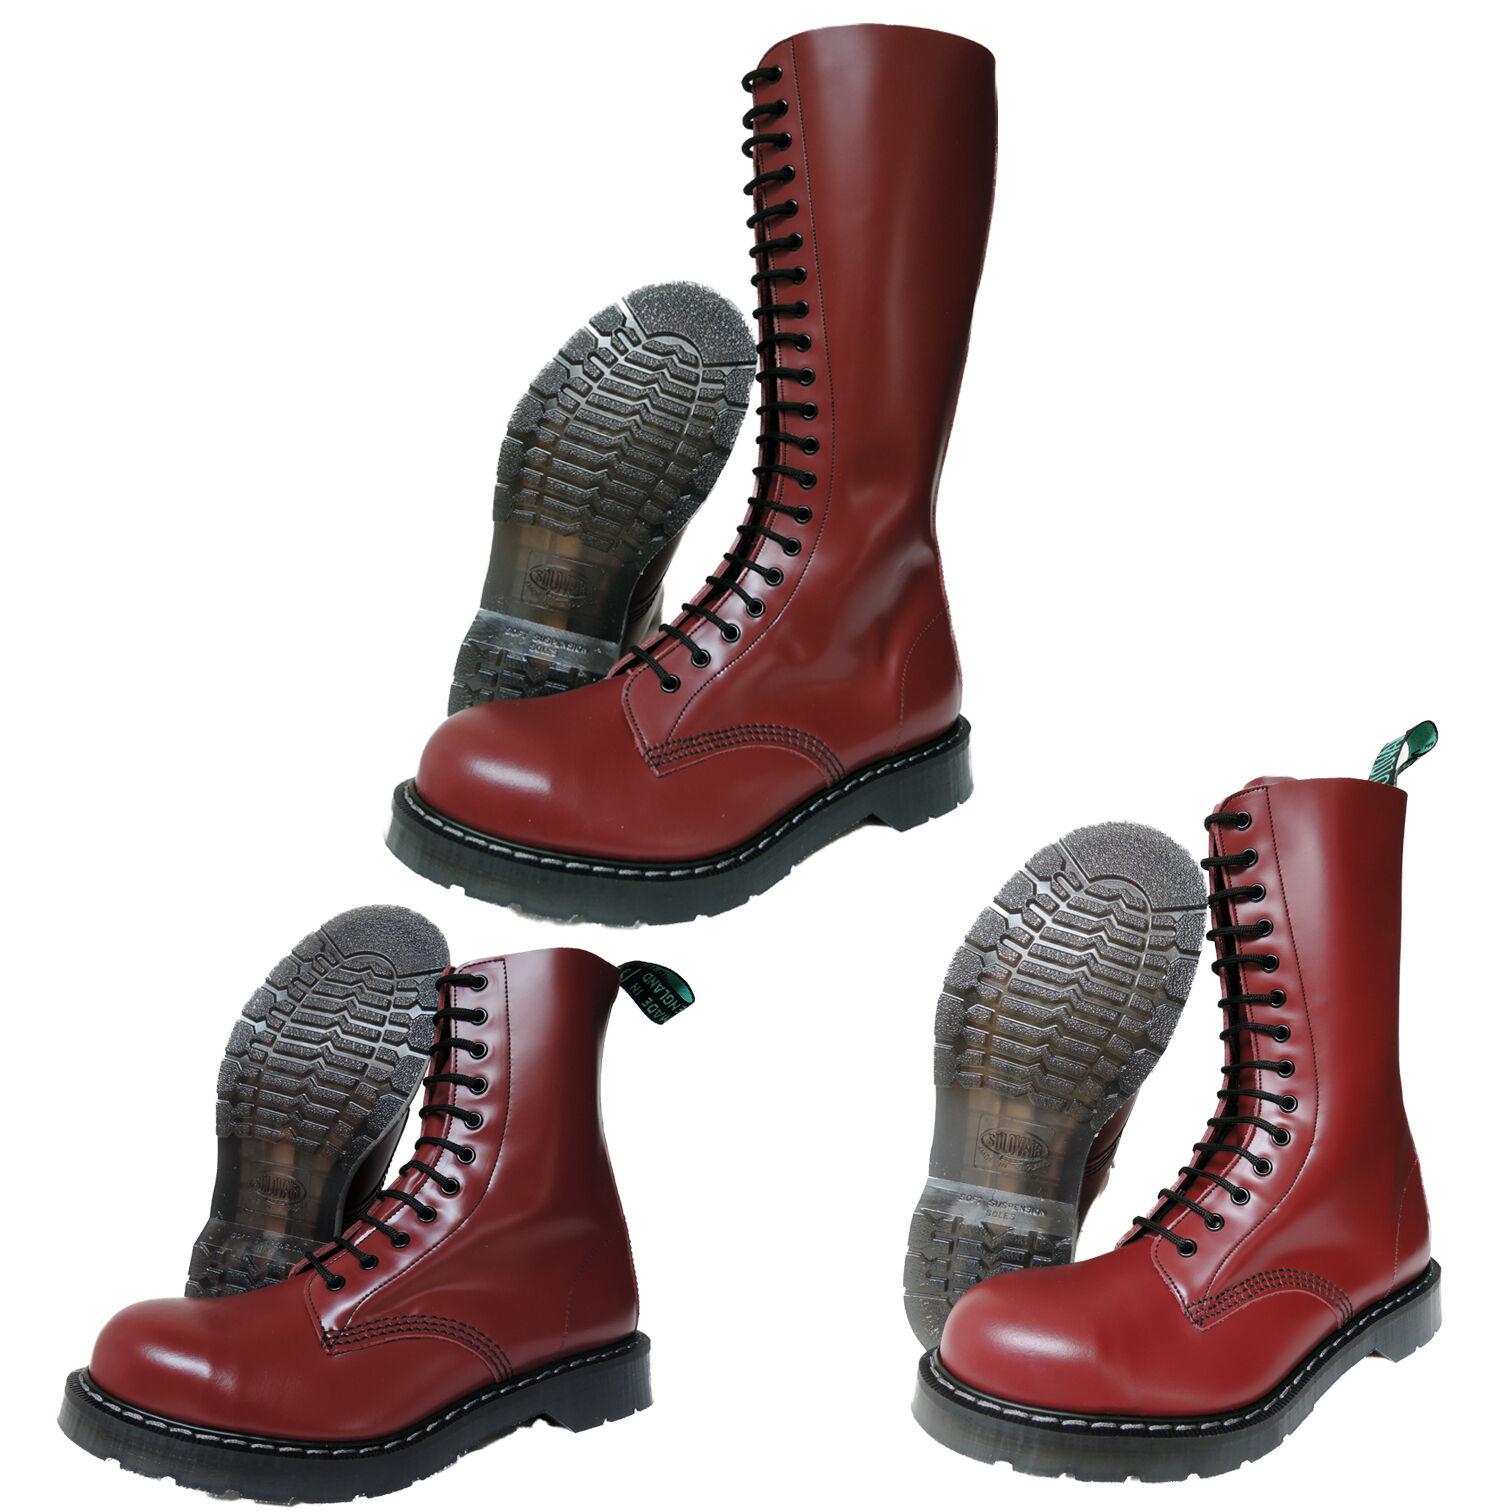 forma unica Solovair NPS handmade in in in Inghilterra Cherry rosso Steel Toe stivali Stivali kirschrot  economico in alta qualità